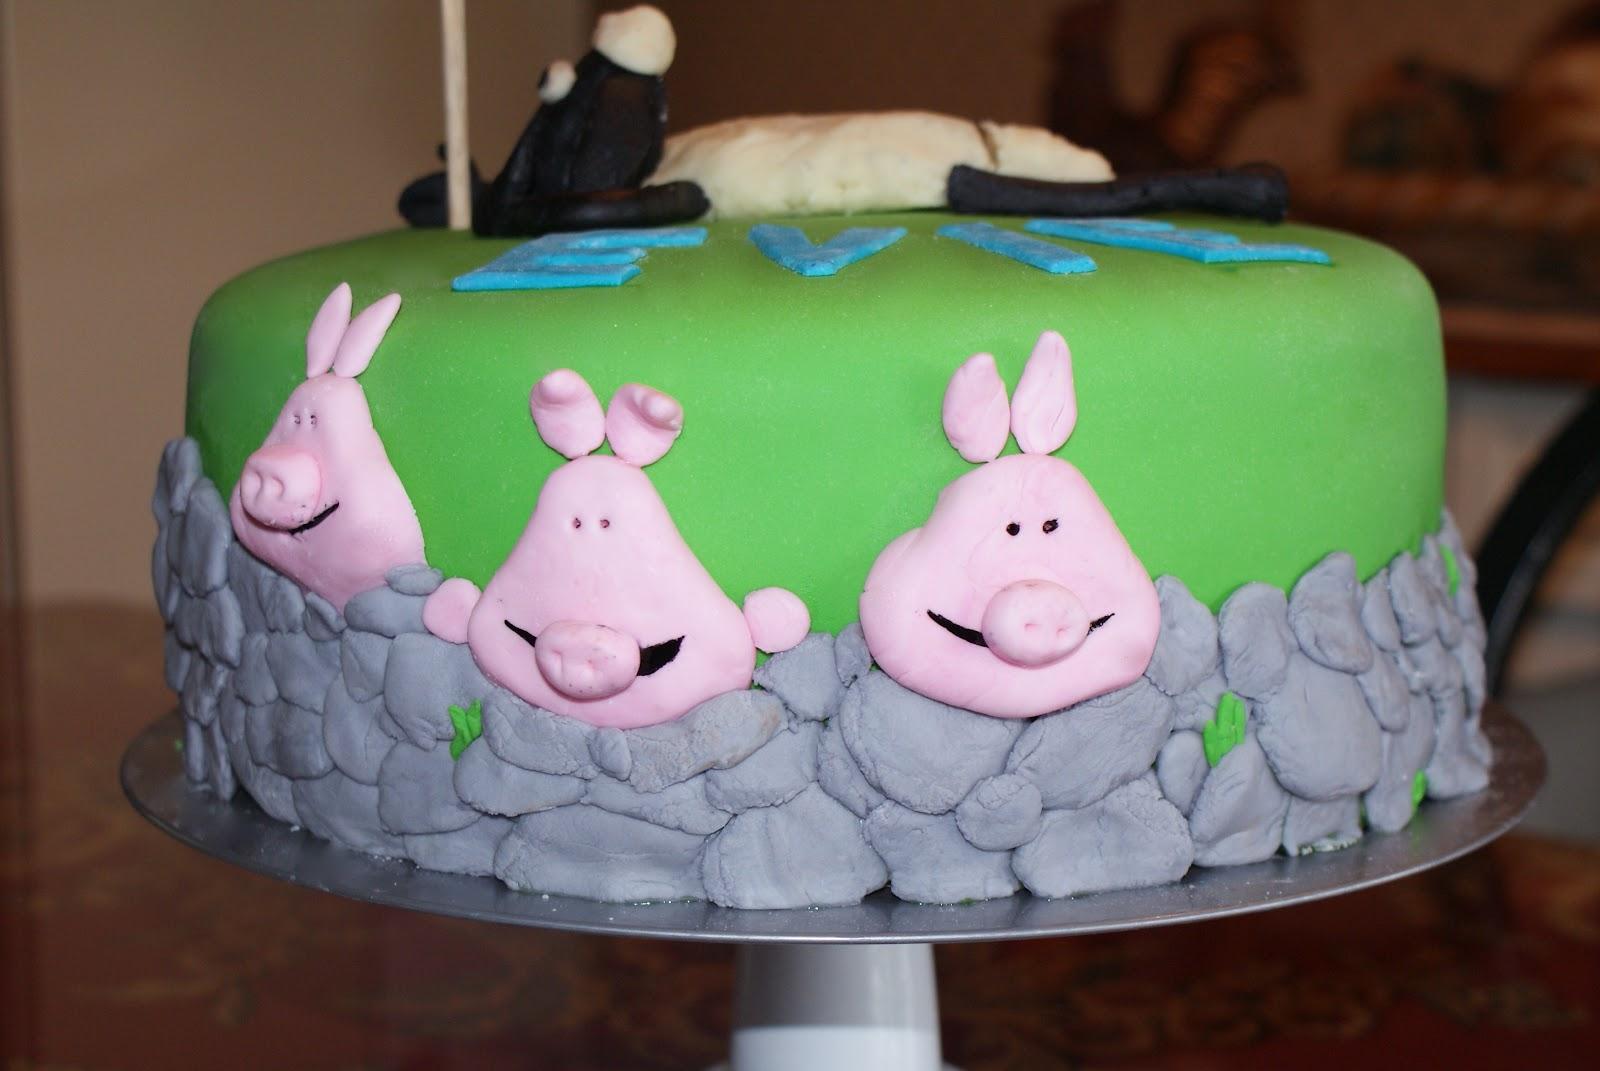 Pyles Of Cake Shaun The Sheep Birthday Cake